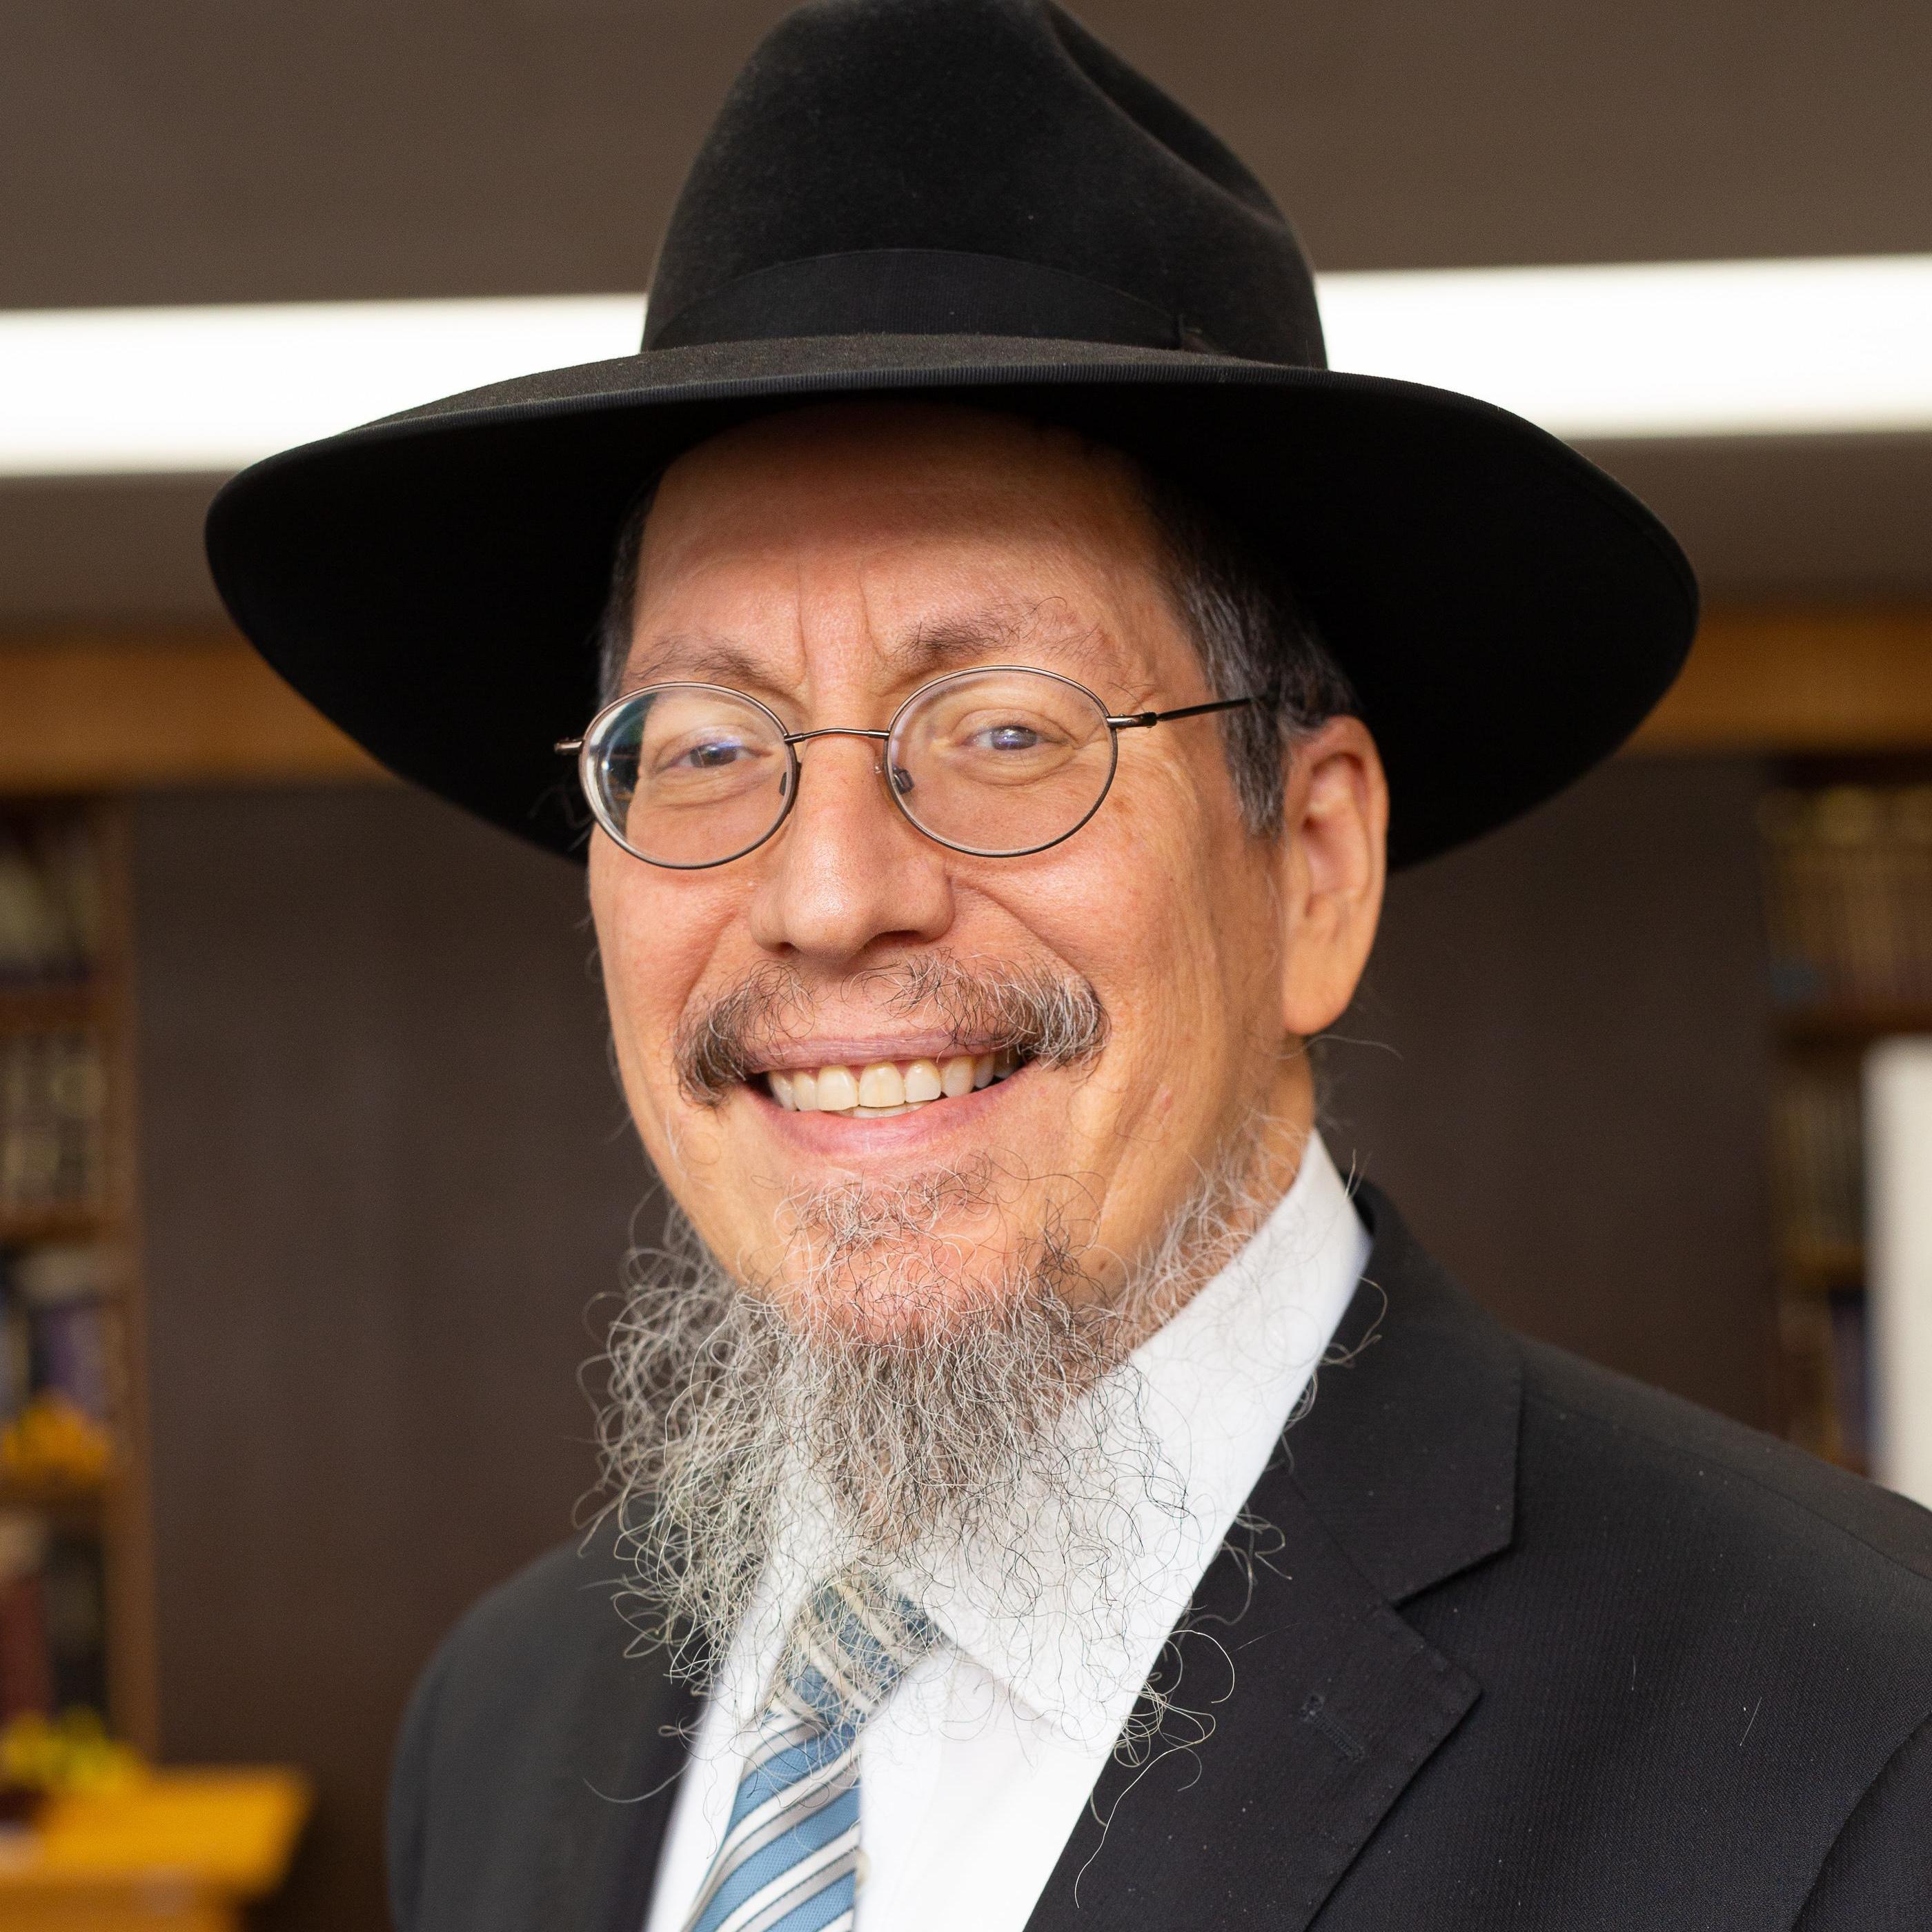 Mordechai Yaffe, Ph.D.'s Profile Photo